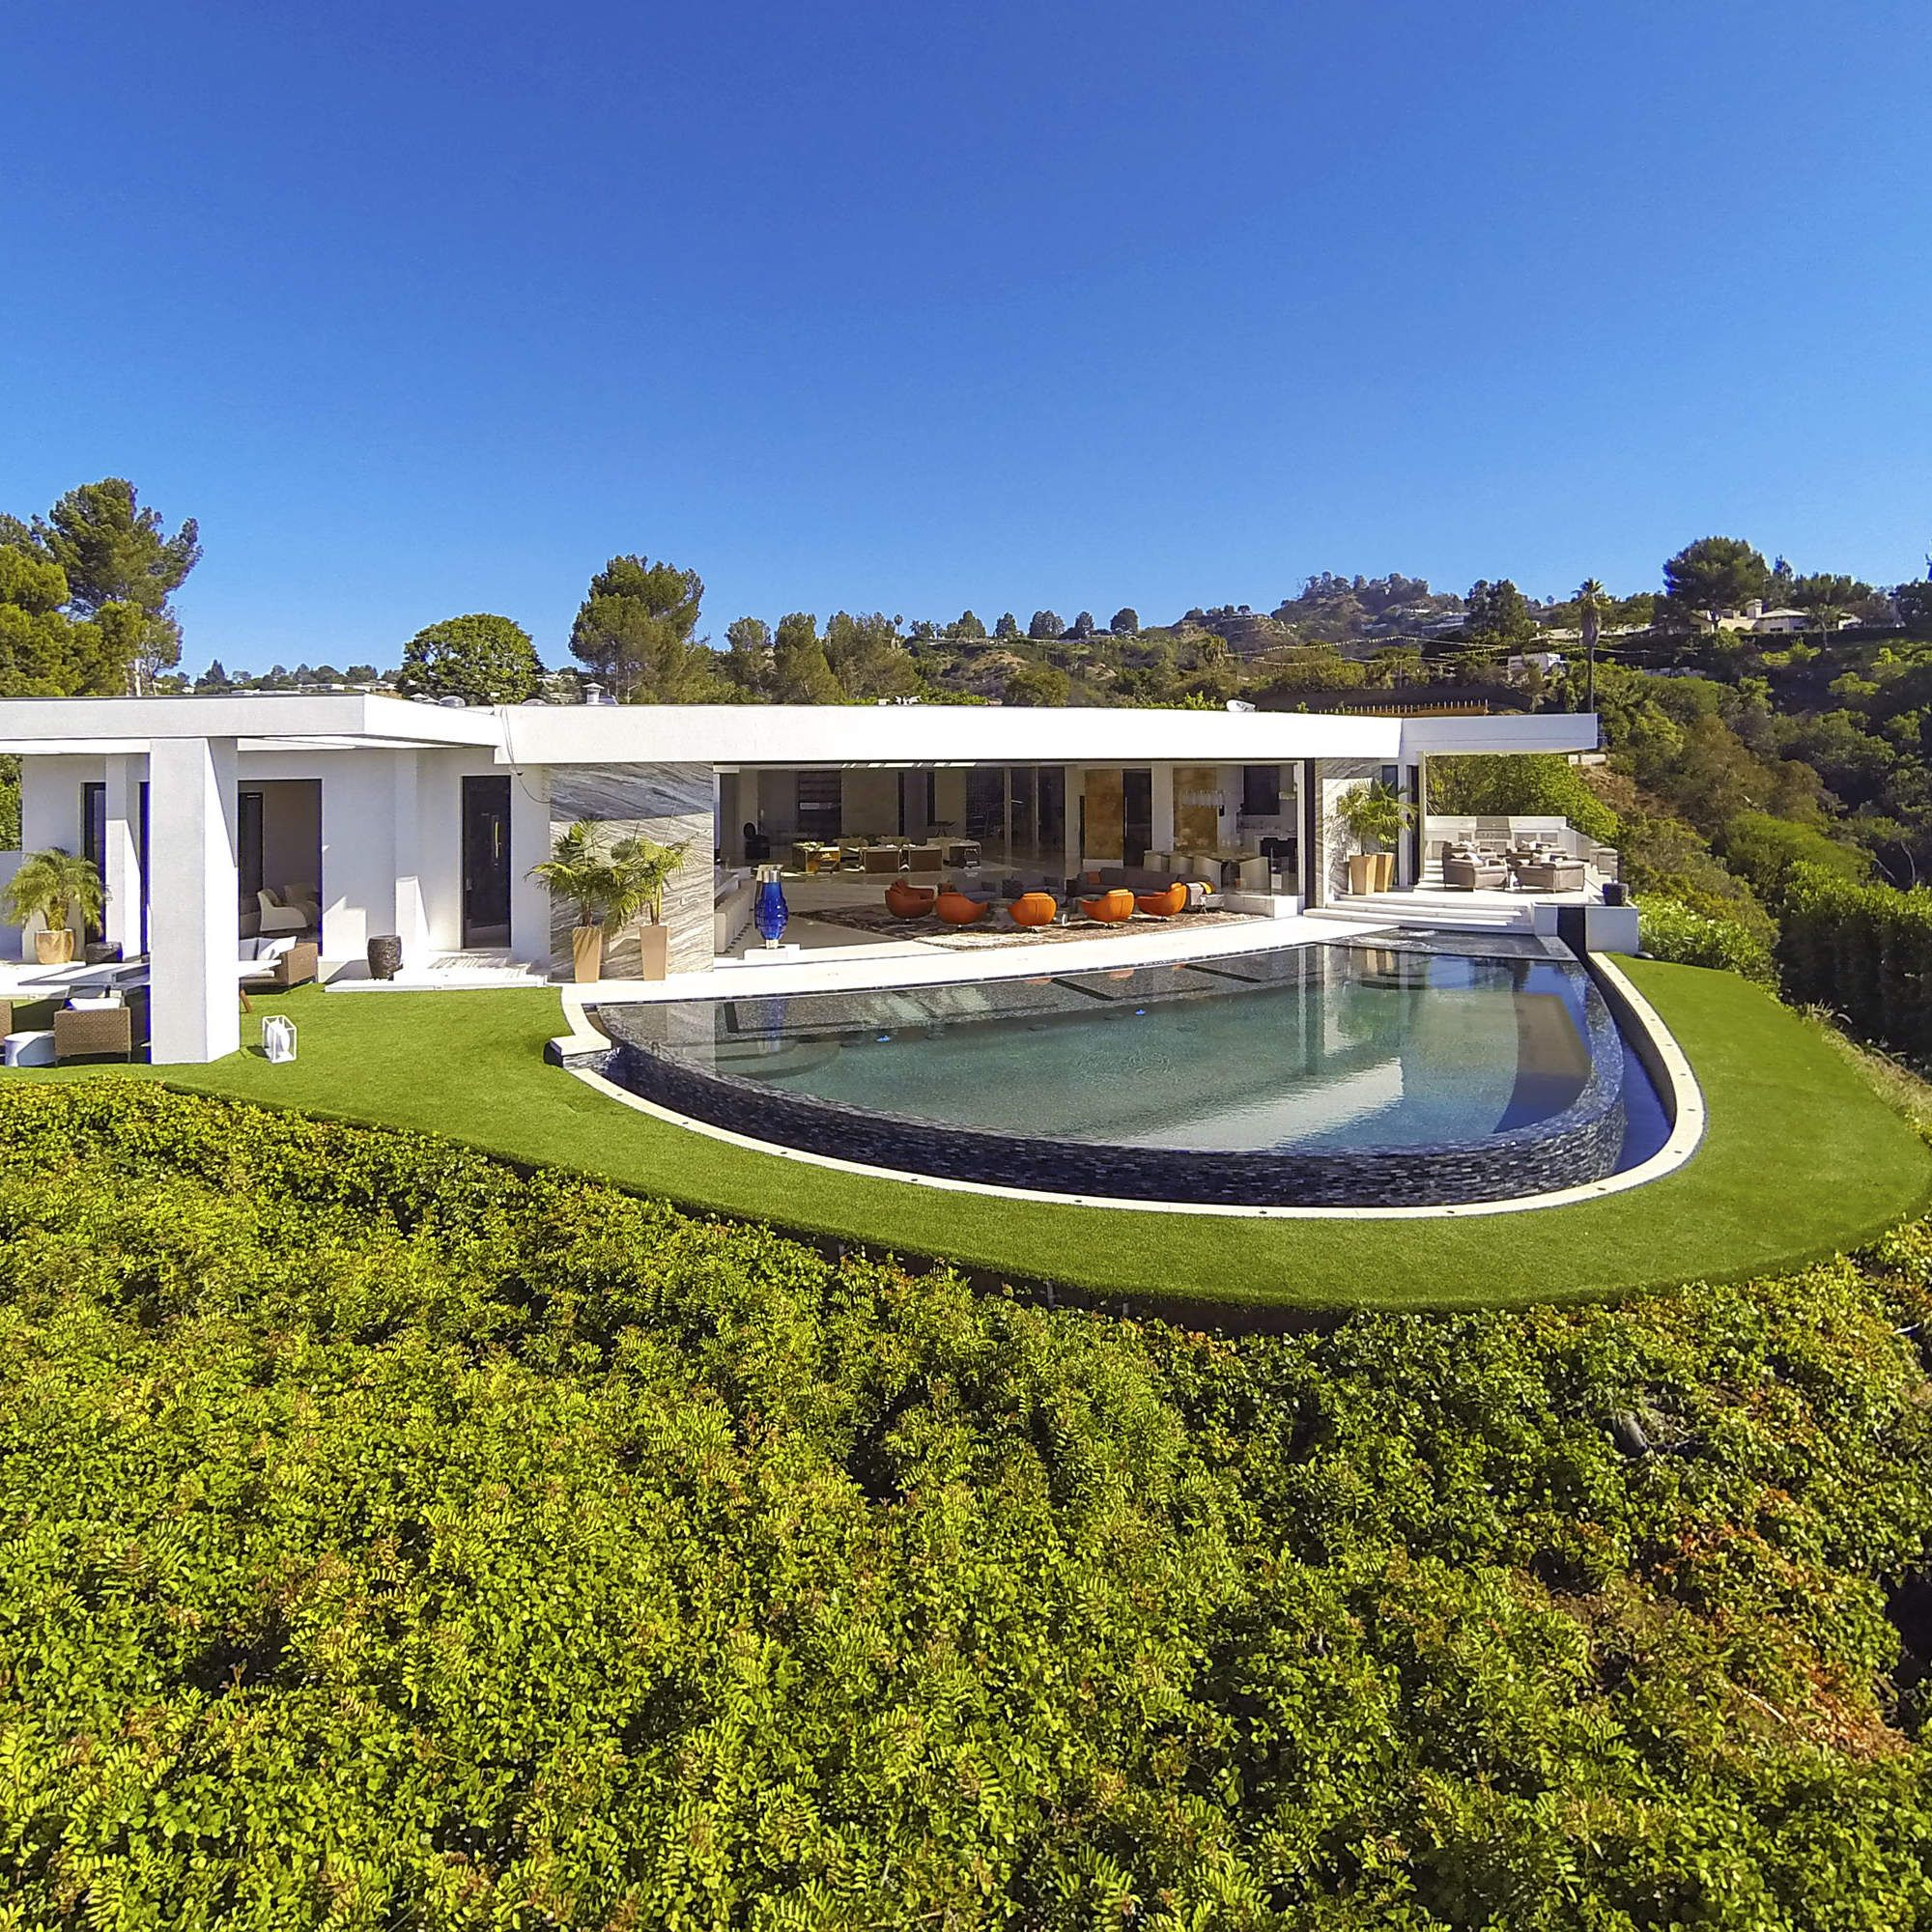 This $12 Million Super-Mansion Would Make Tony Stark Jealous